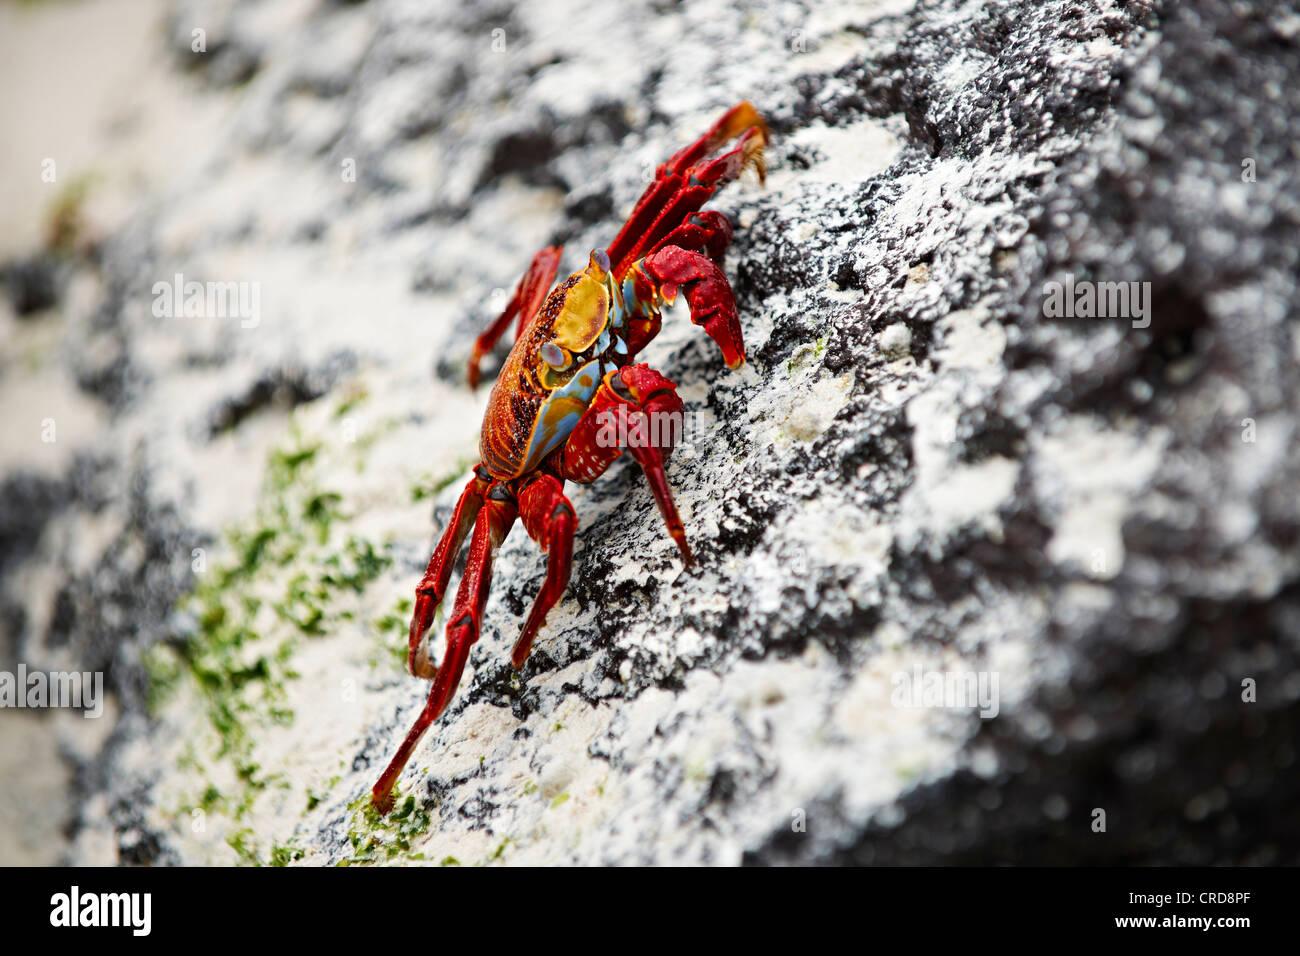 Red rock crab (Grapsus grapsus), Santa Cruz, Galapagos Islands - Stock Image